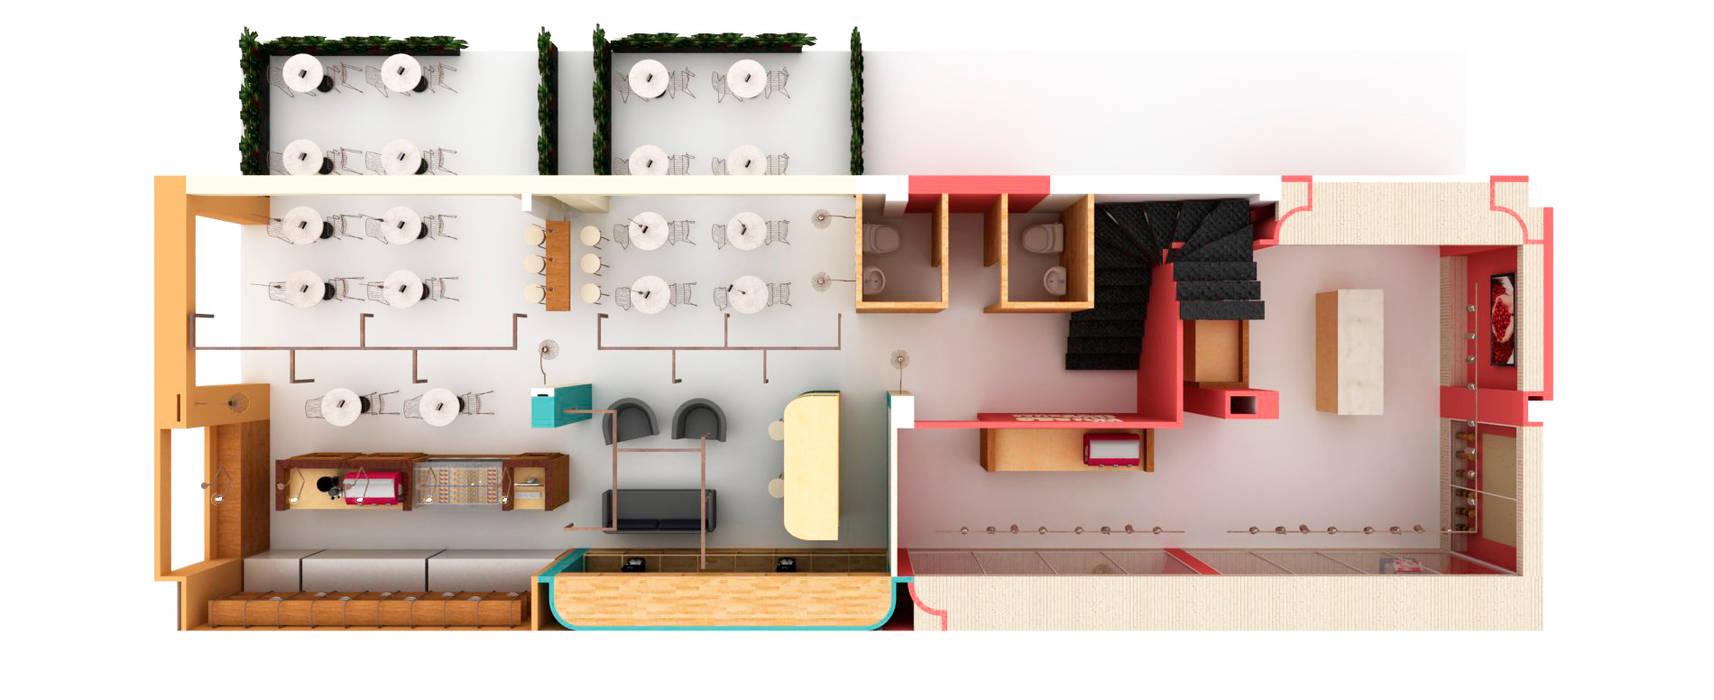 TOUCAN CAFÉ: Bares y discotecas de estilo  por @tresarquitectos,